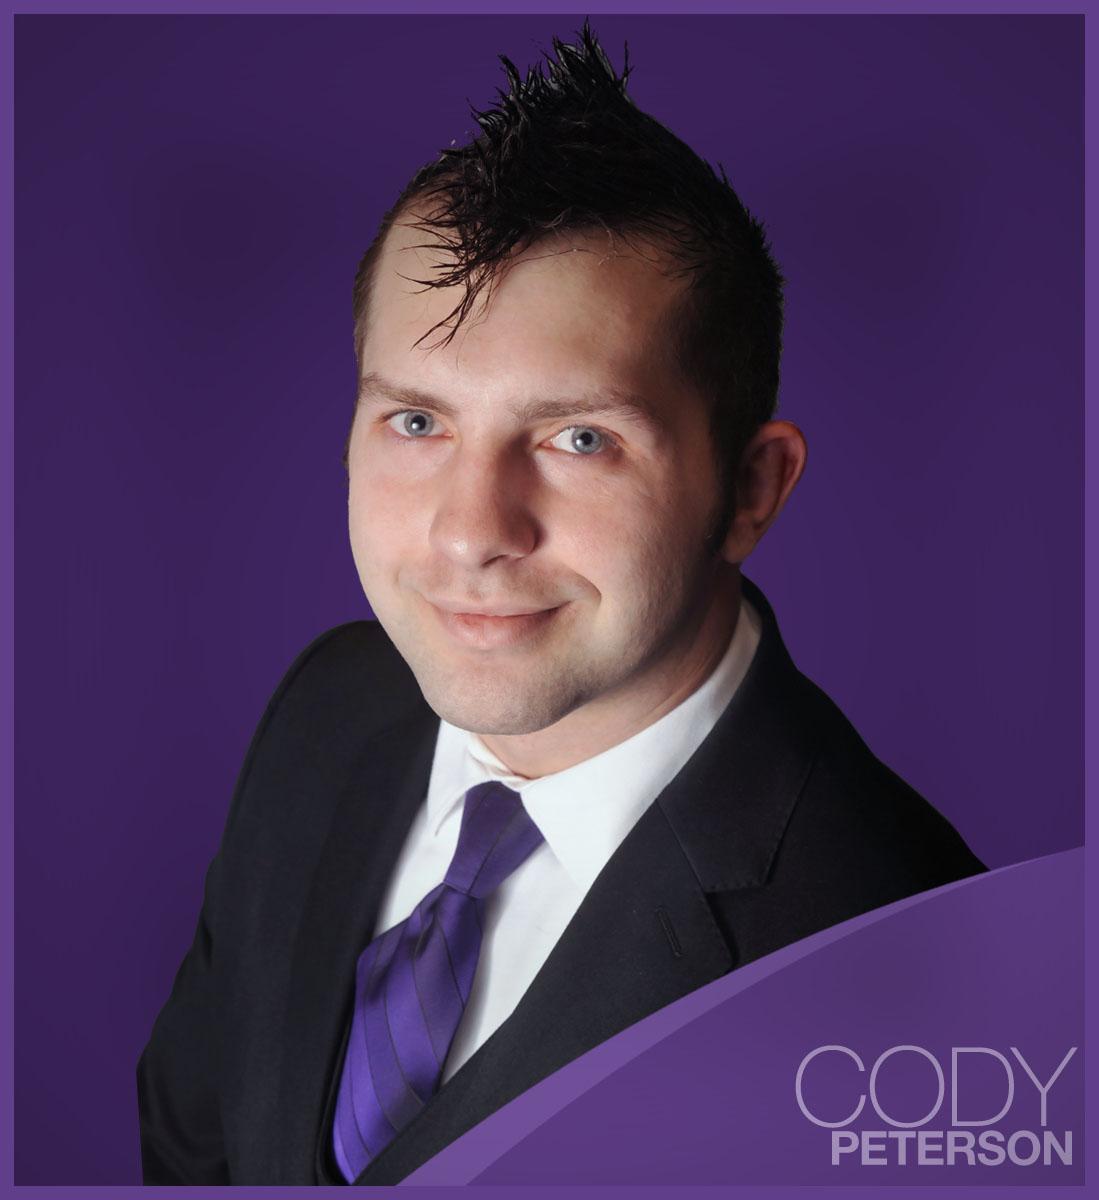 Cody Peterson